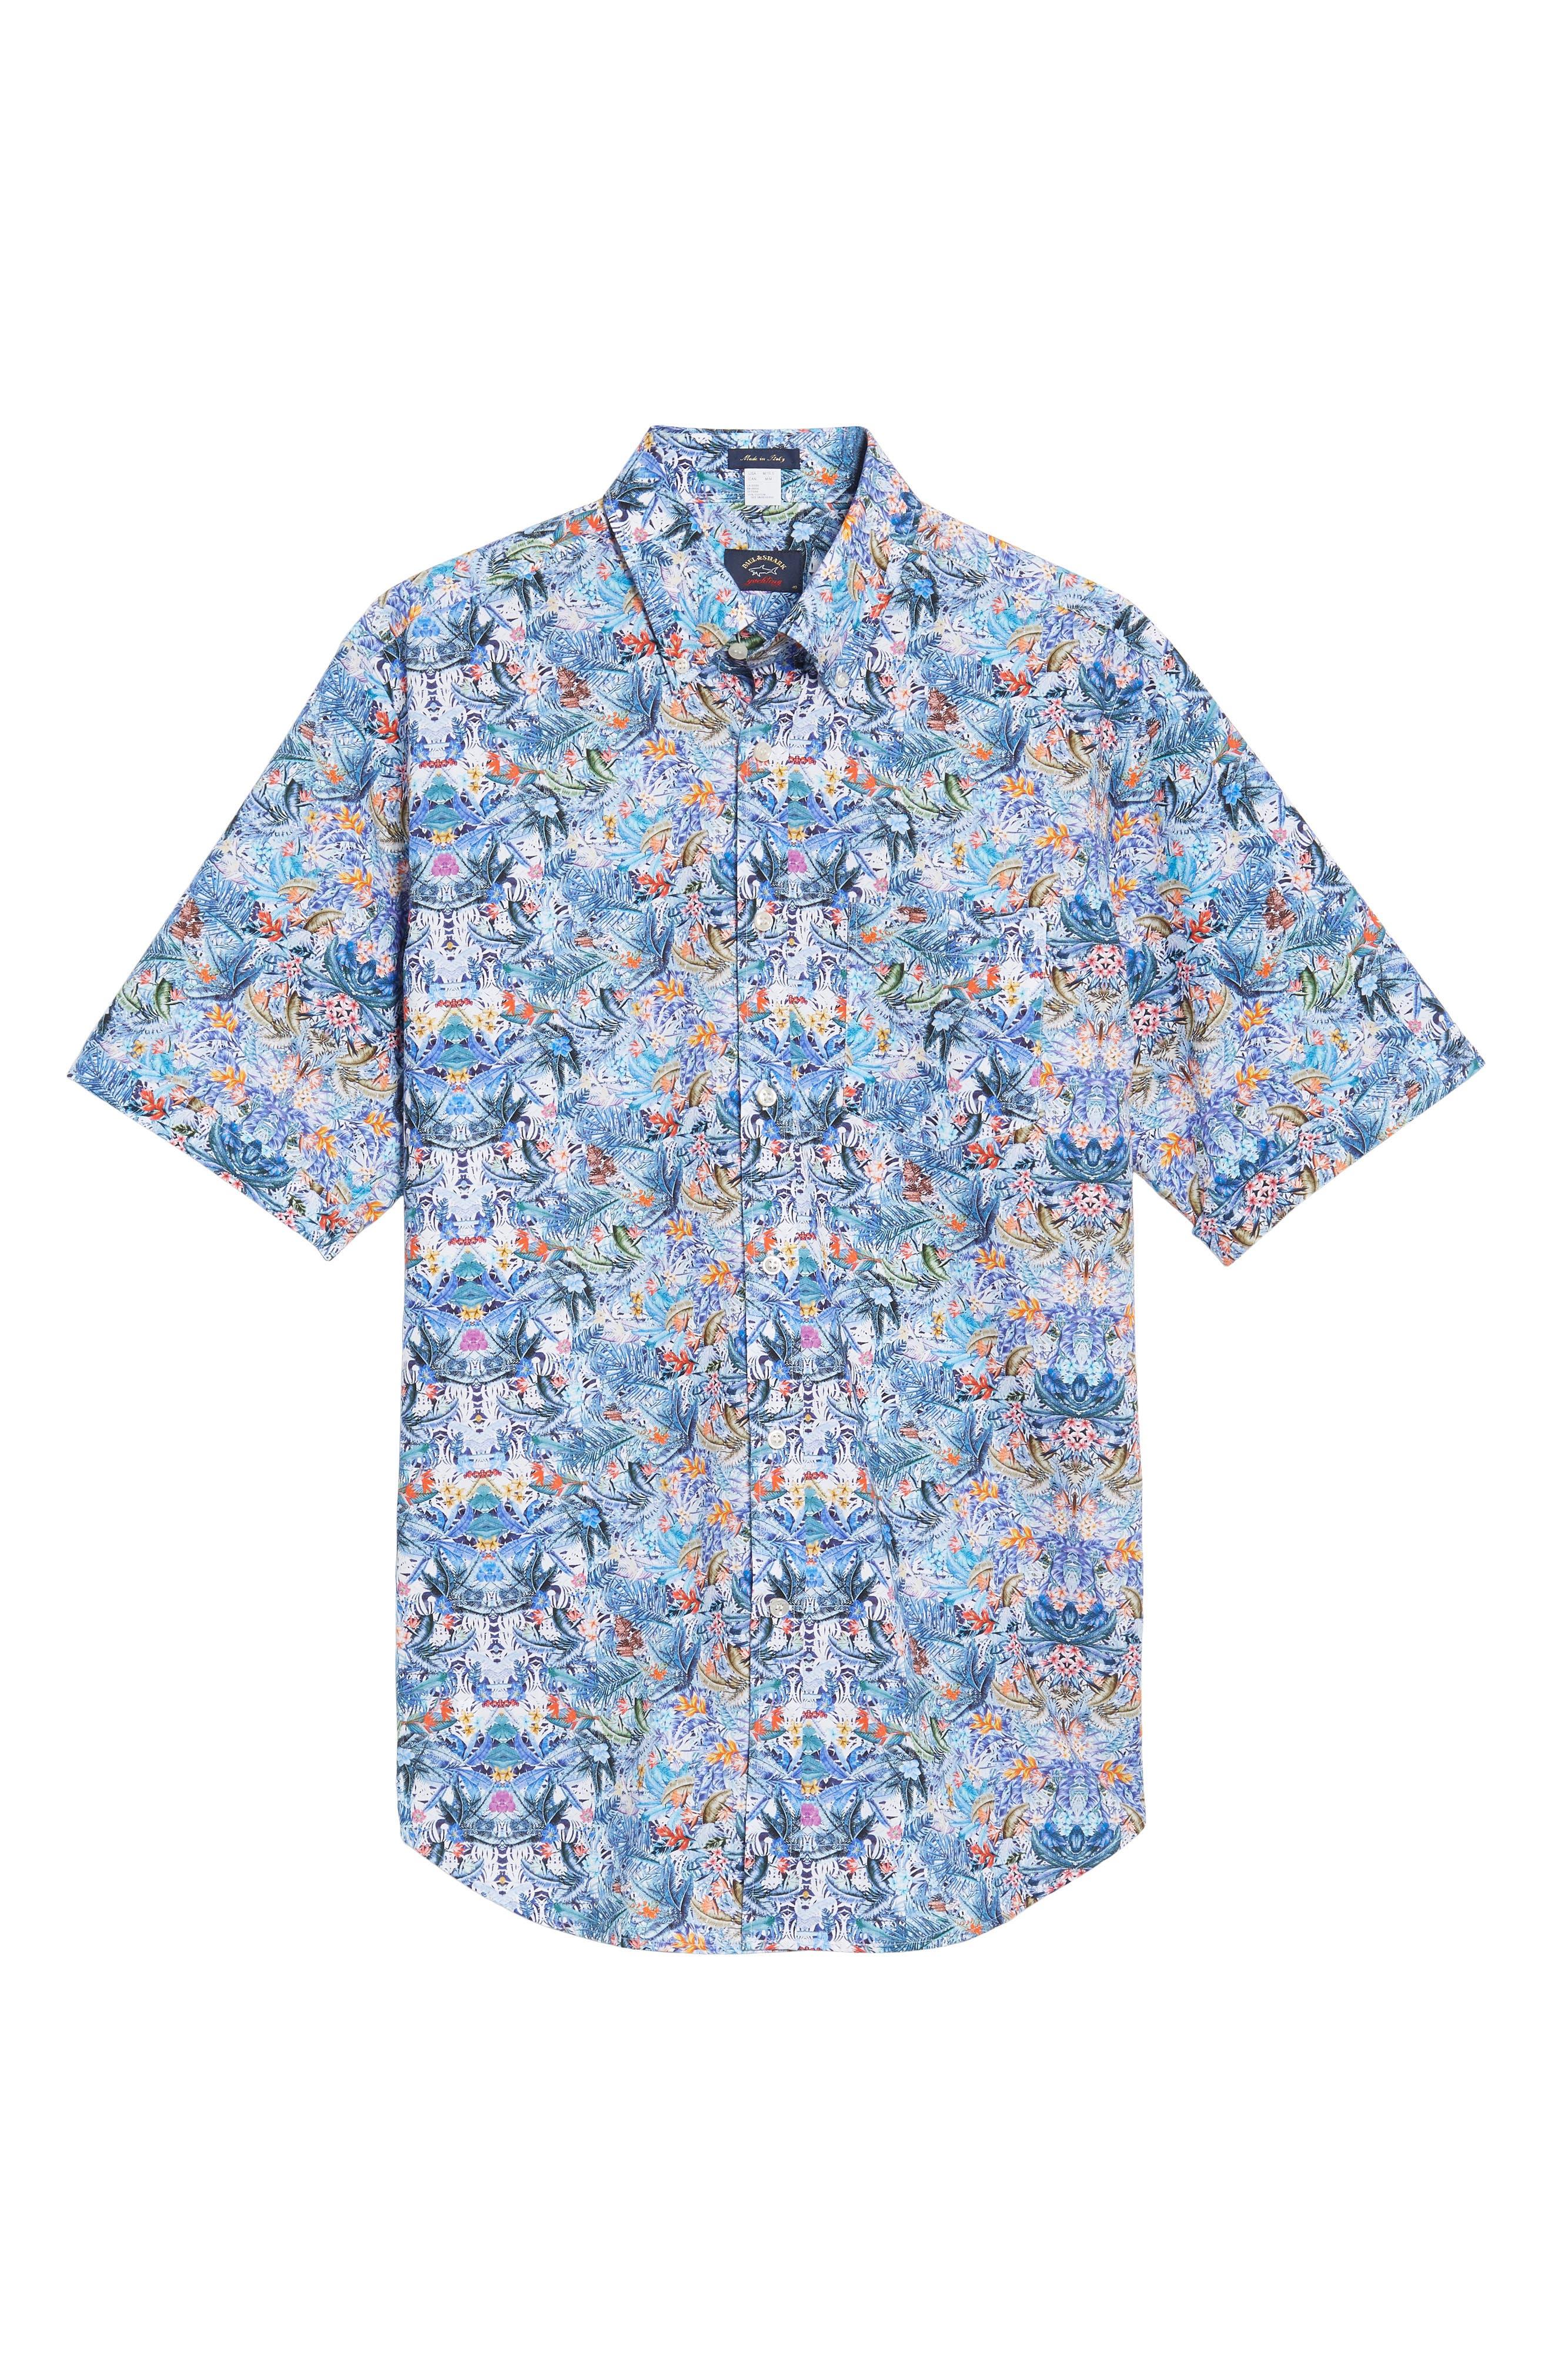 Paul&Shark Regular Fit Tropical Print Sport Shirt,                             Alternate thumbnail 6, color,                             Multi